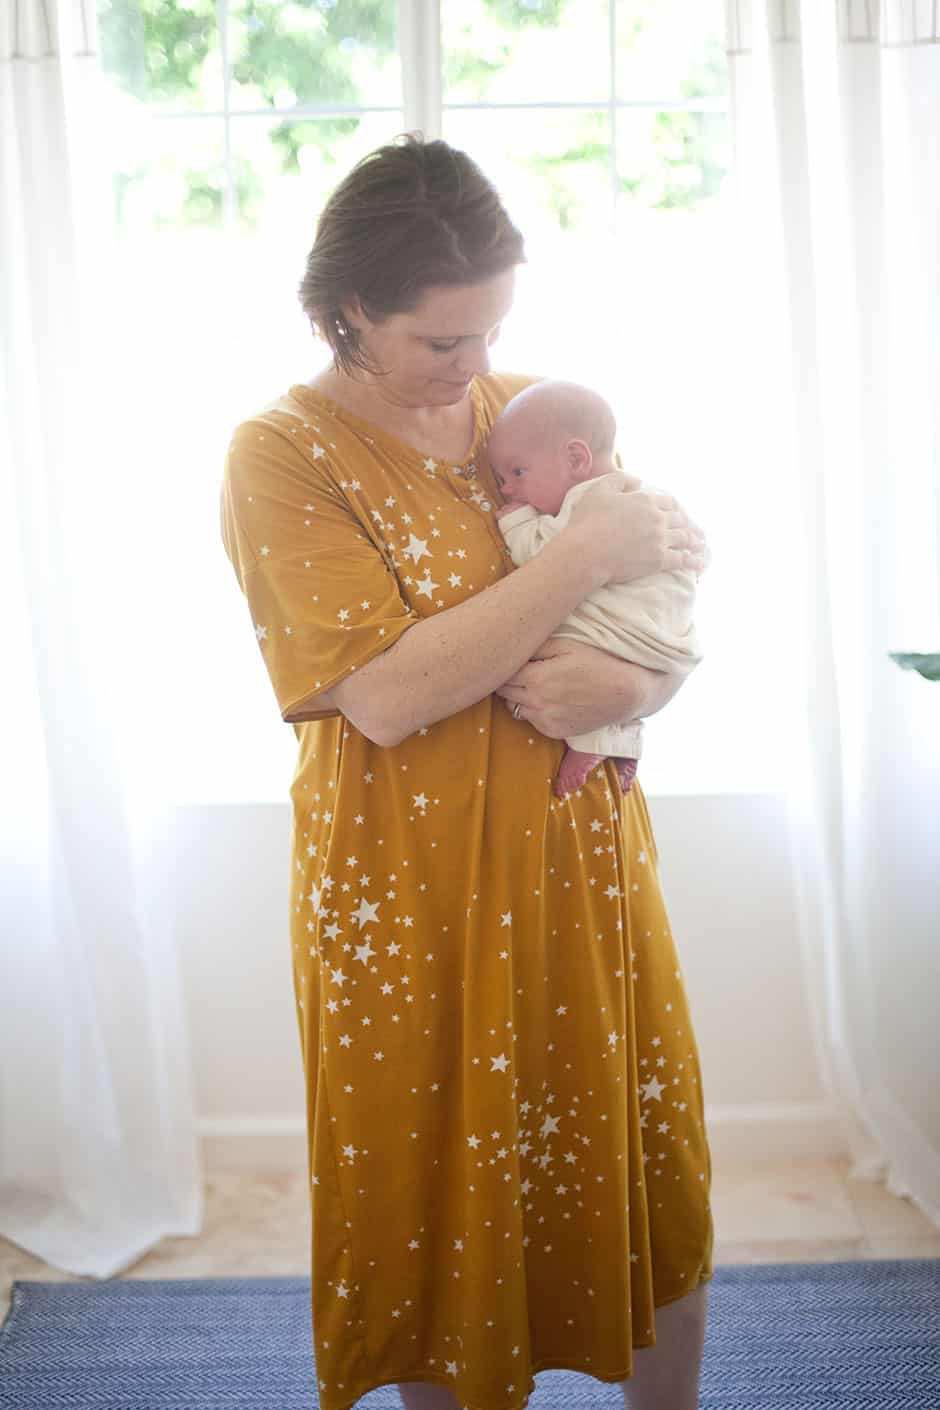 postpartum mom and newborn